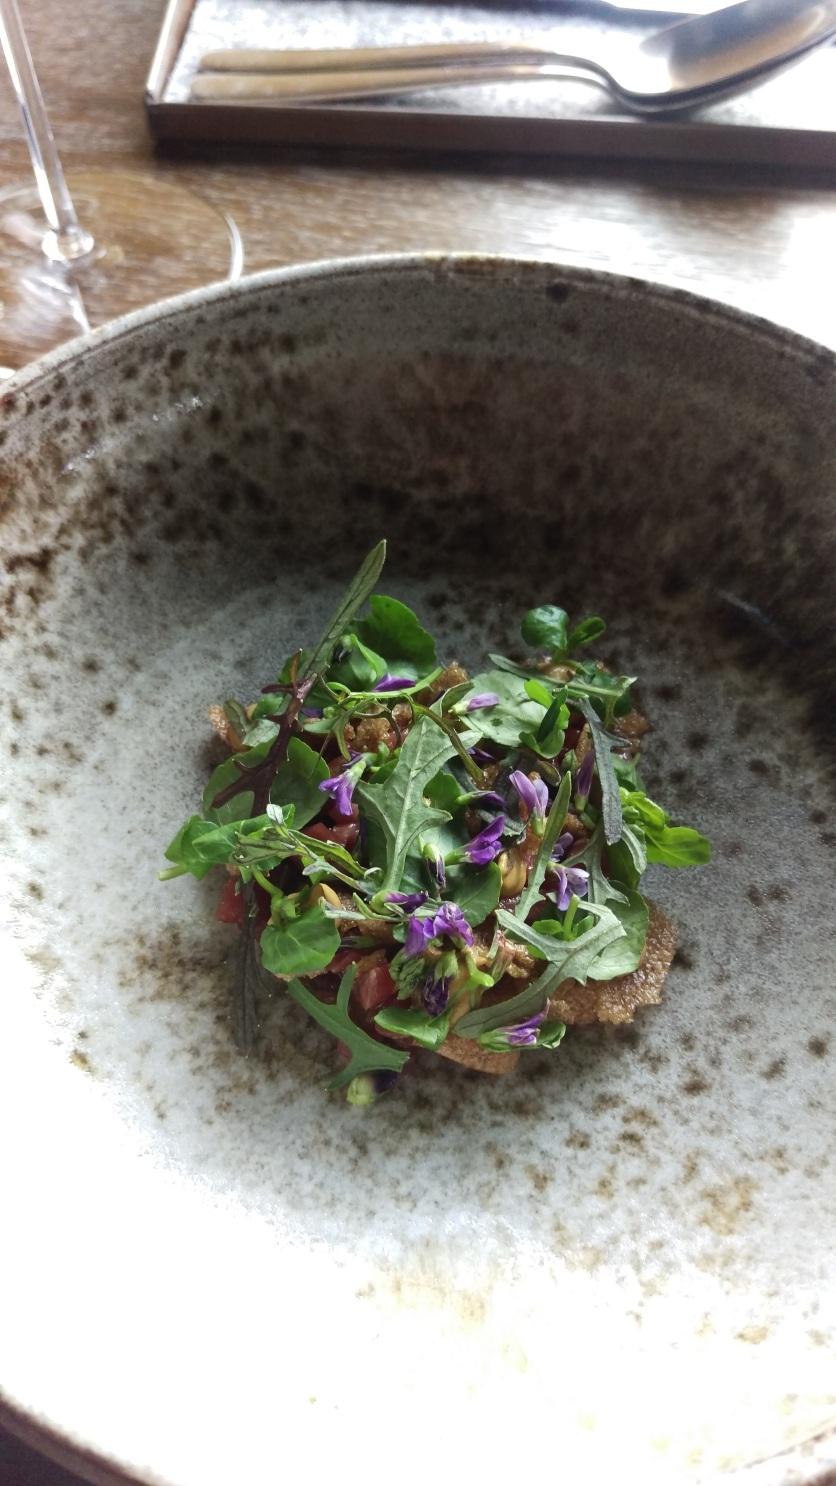 120 day aged beef neck, bitter herbs, chesnut glaze, mushroom chips